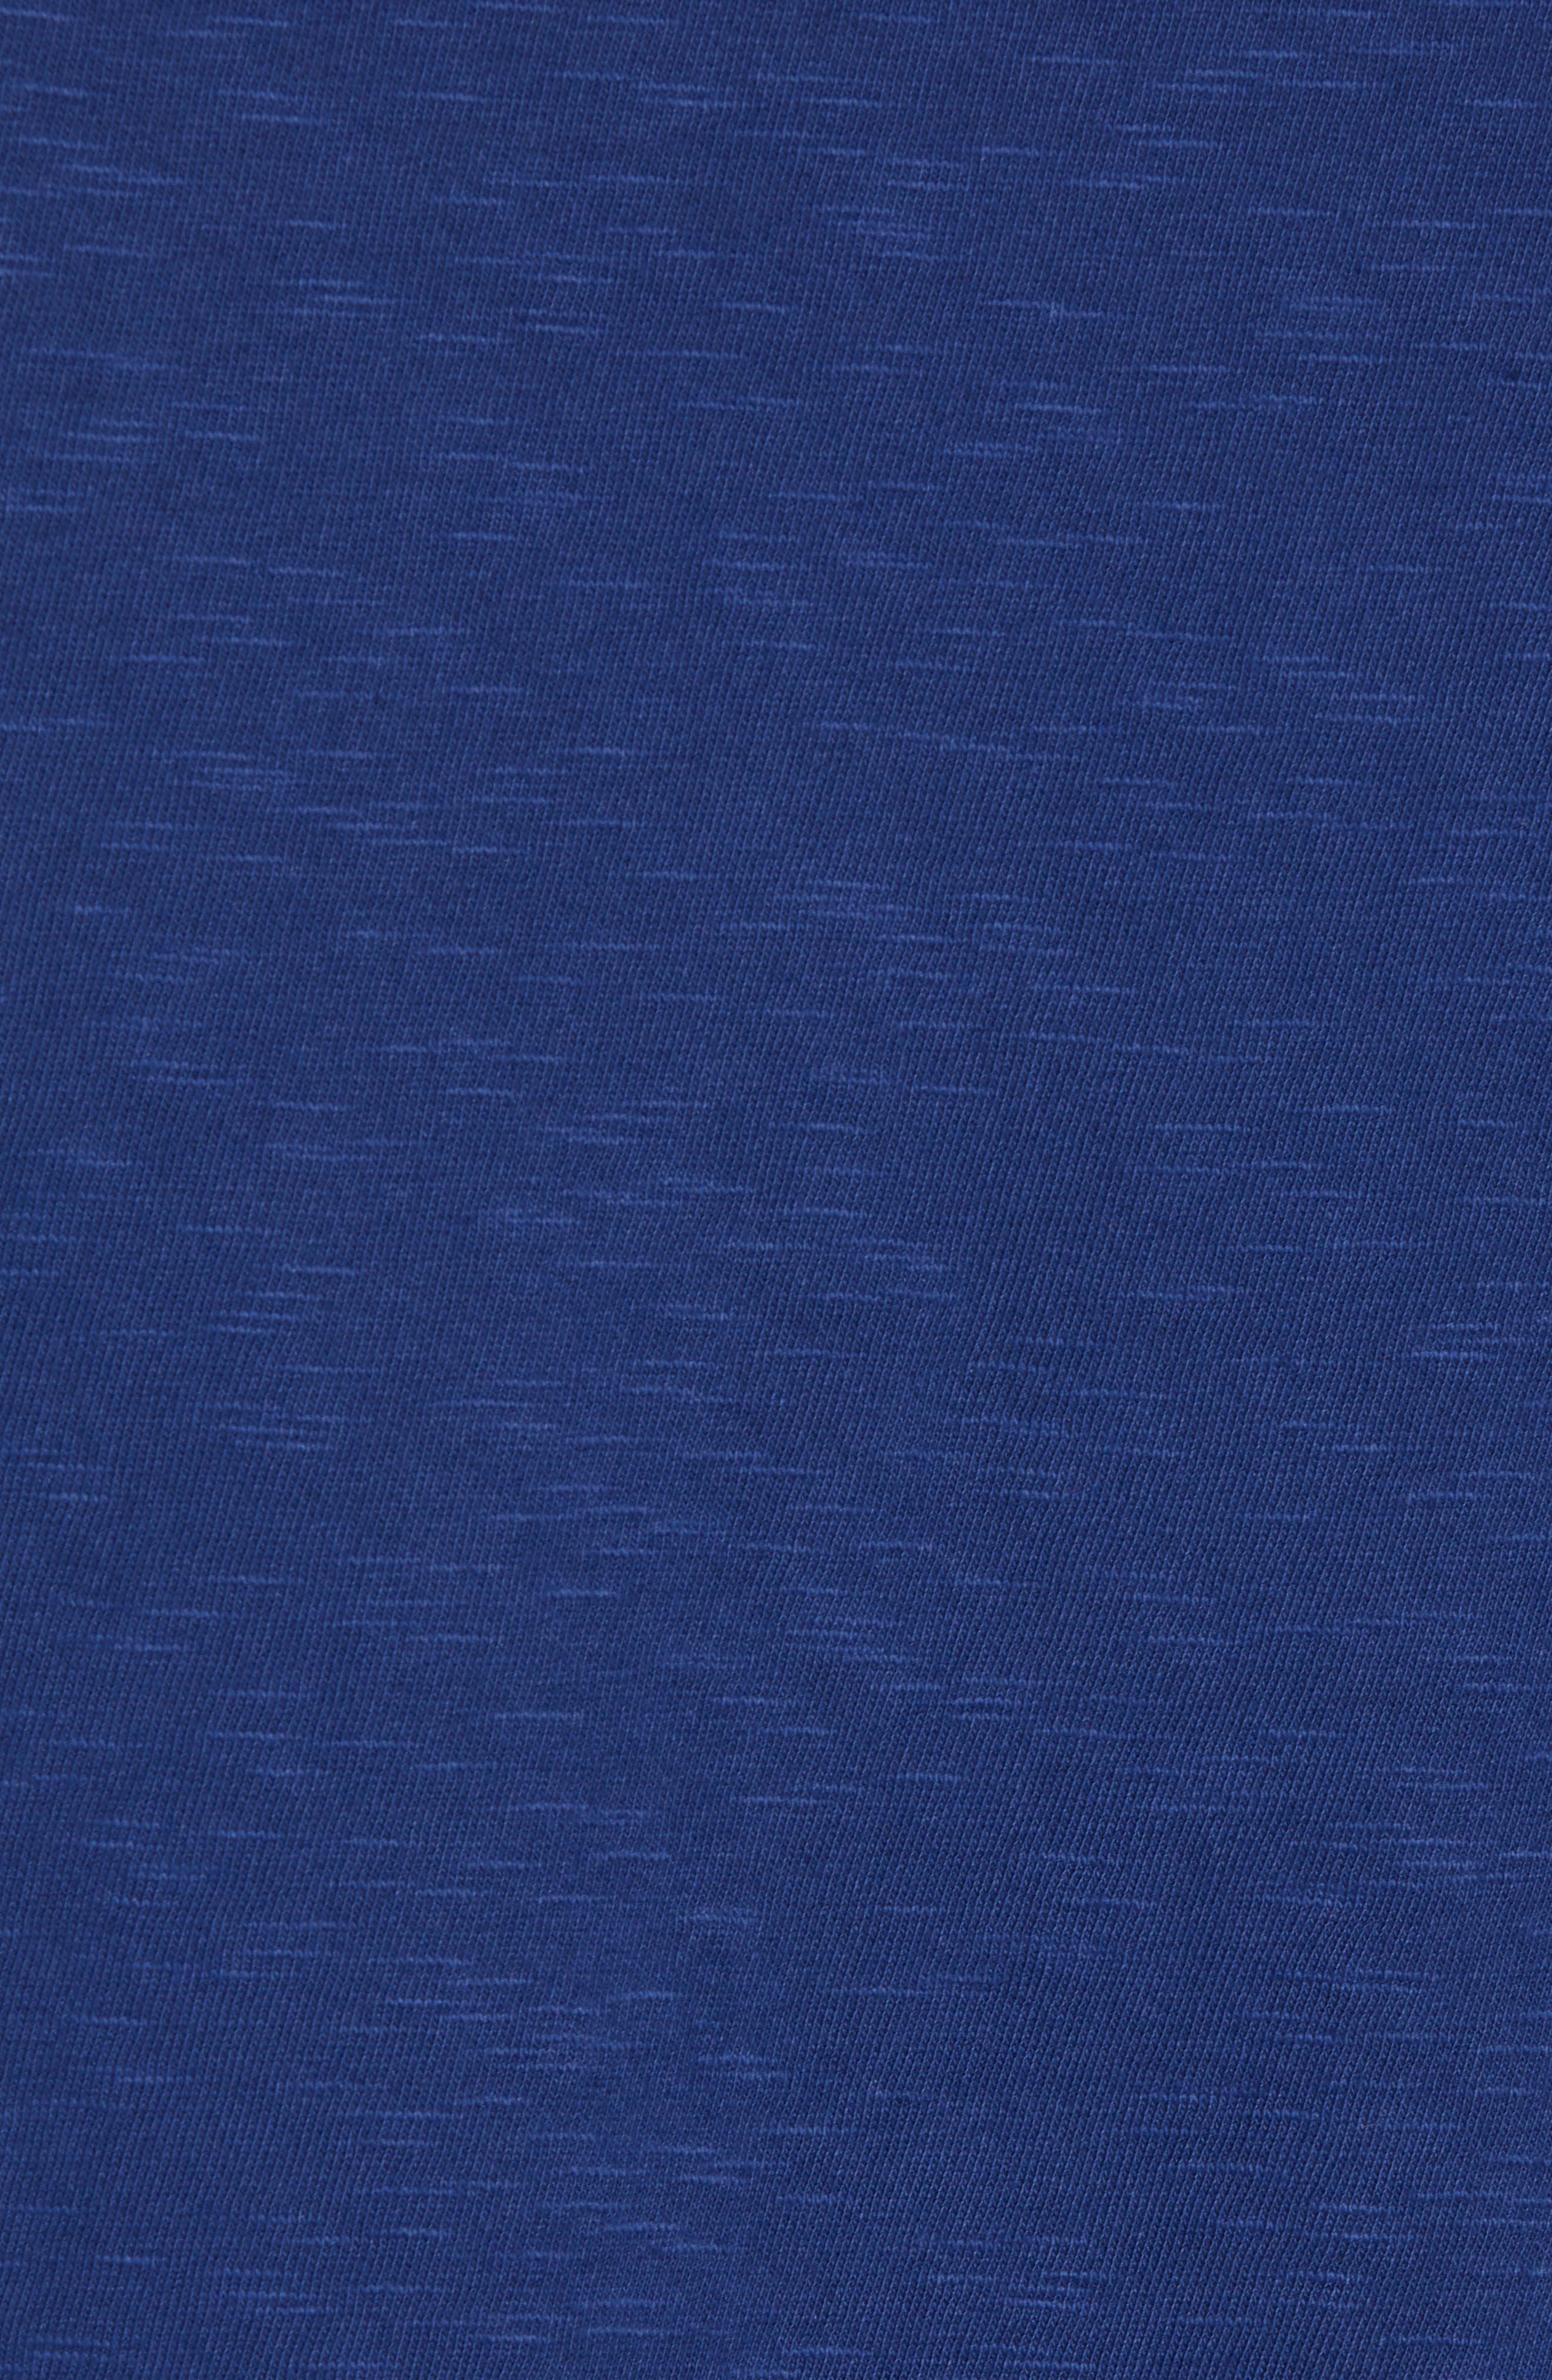 Bleu Slubbed T-Shirt,                             Alternate thumbnail 5, color,                             FATHOM BLUE BLACK